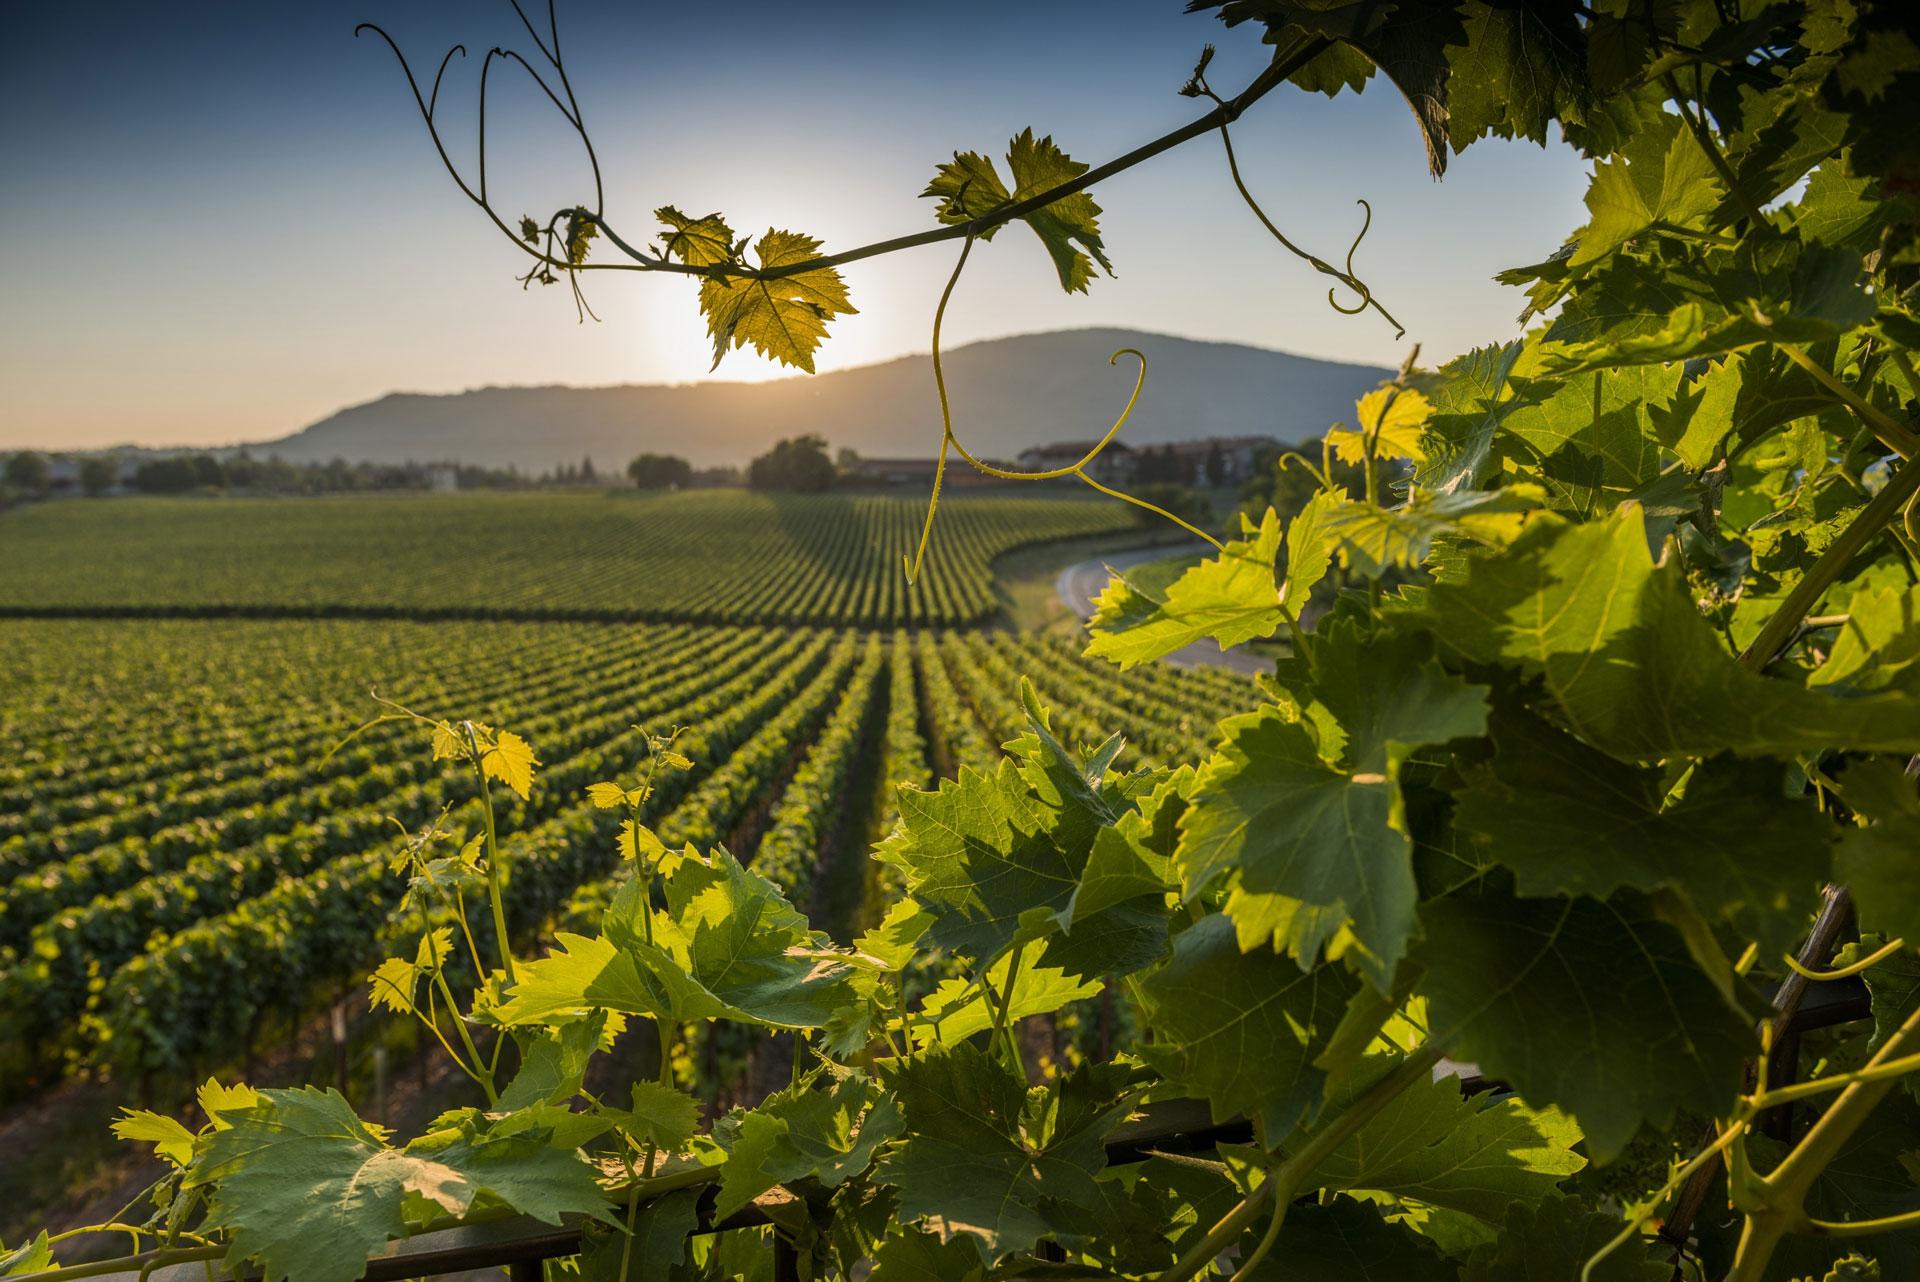 viaggio in franciacorta, la terra del vino